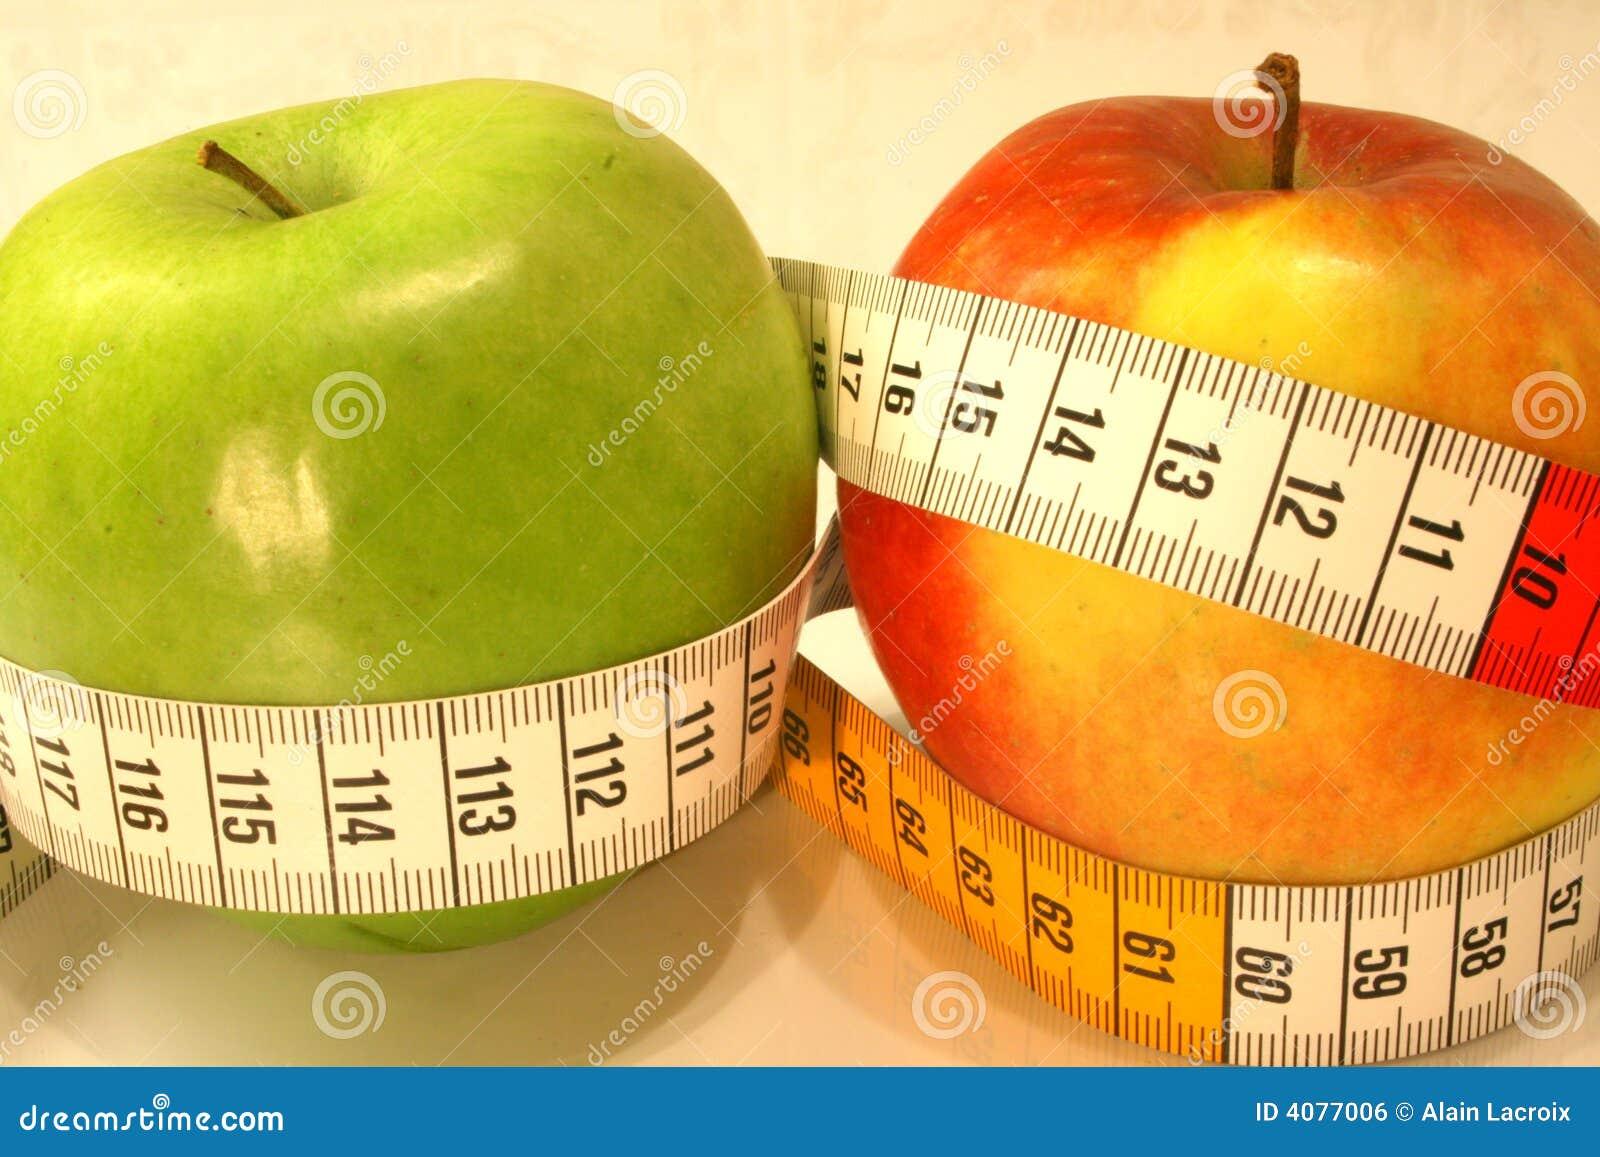 Diet apples II